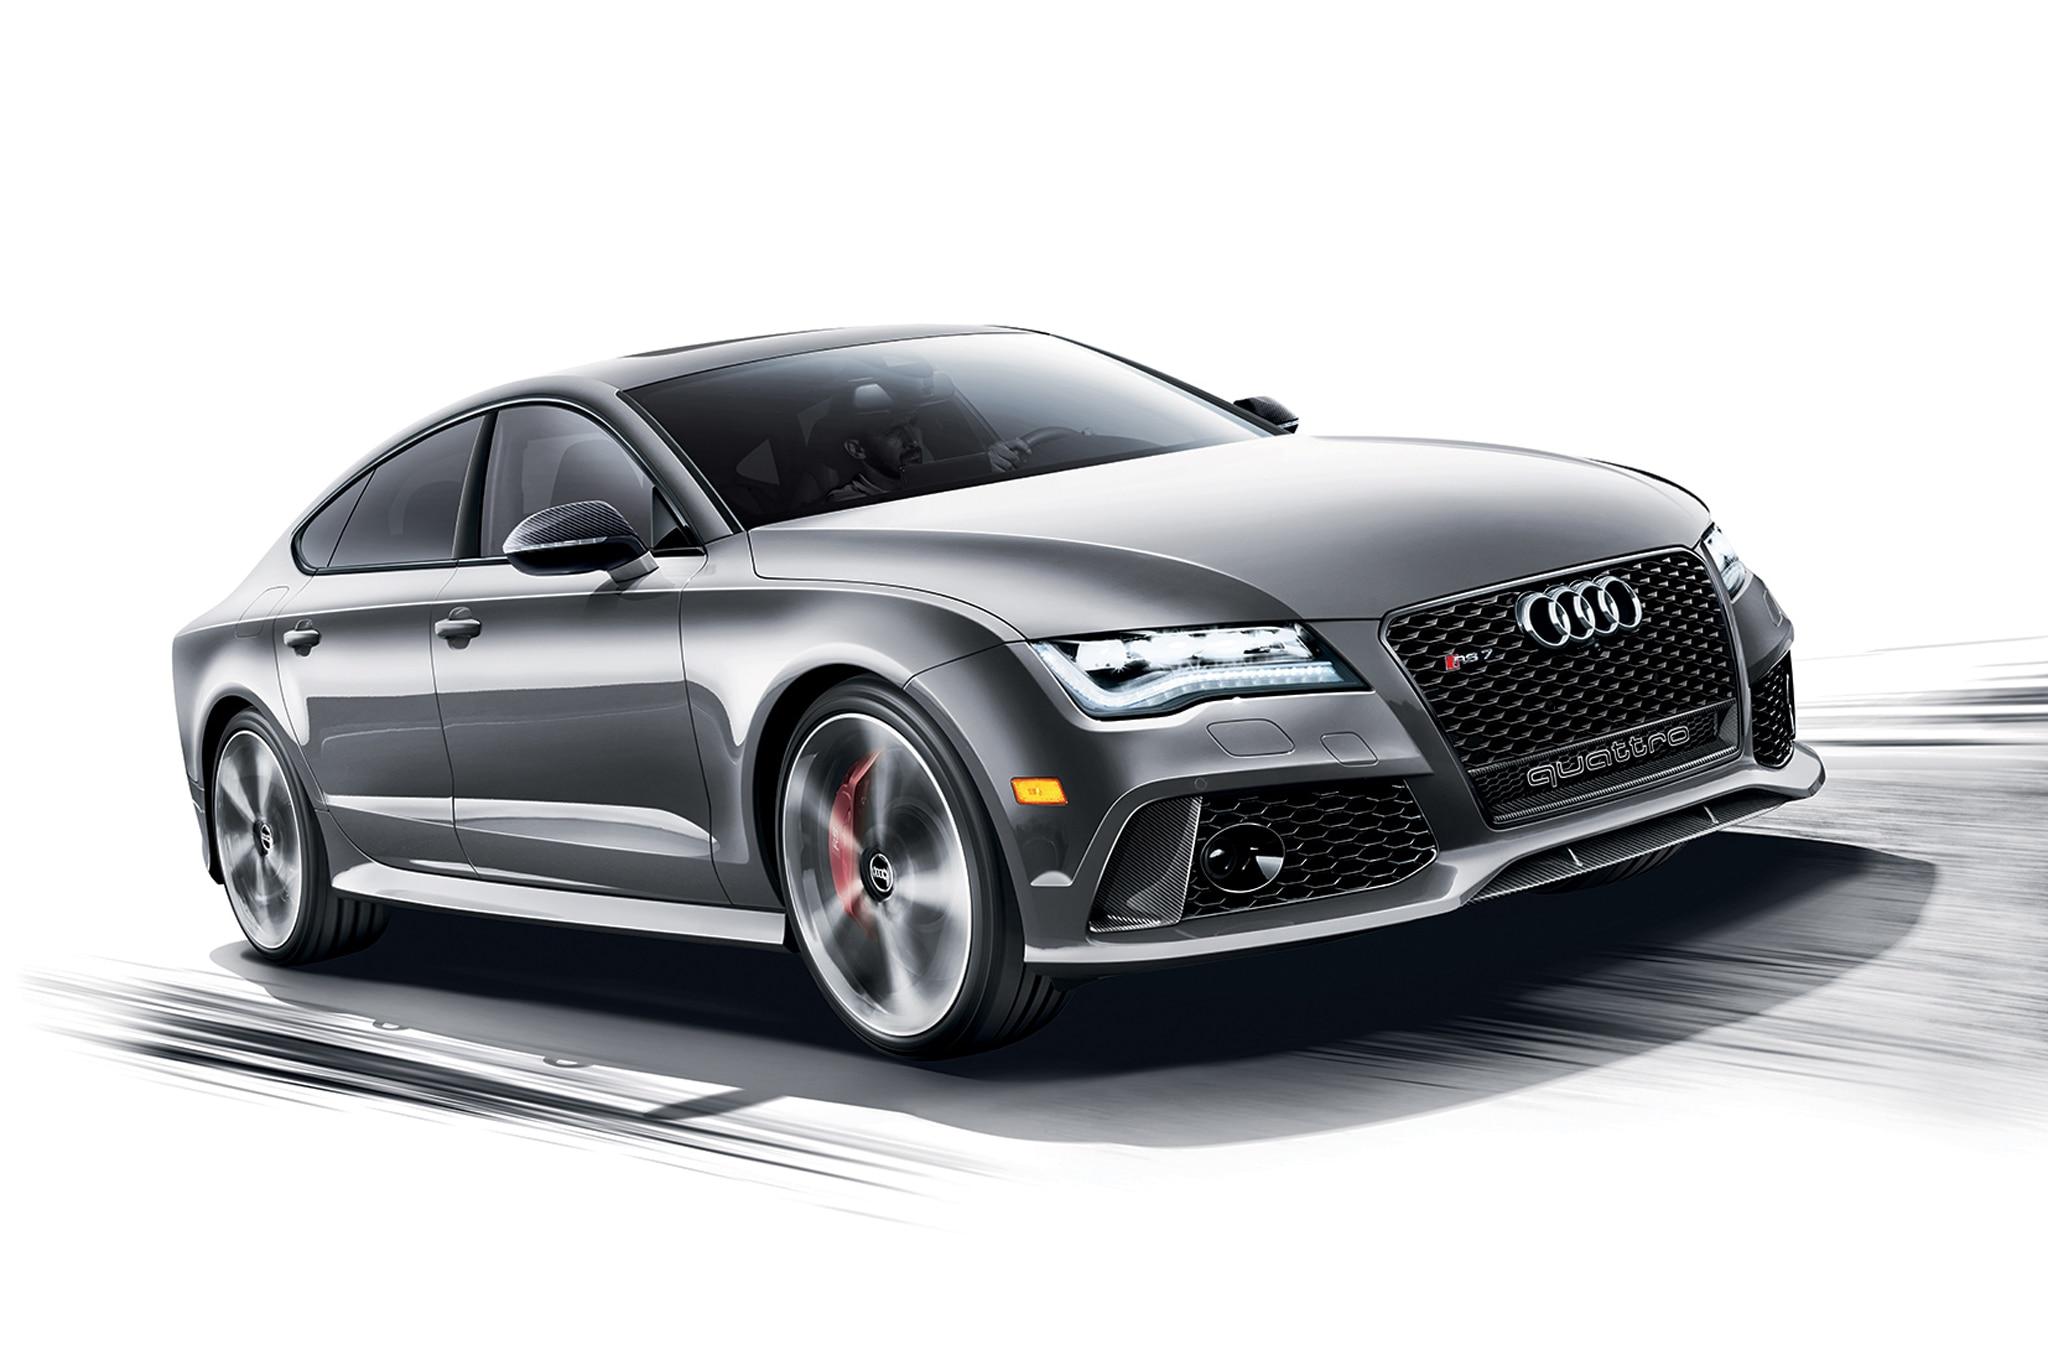 2014 Audi RS 7 Dynamic Edition Sketch1